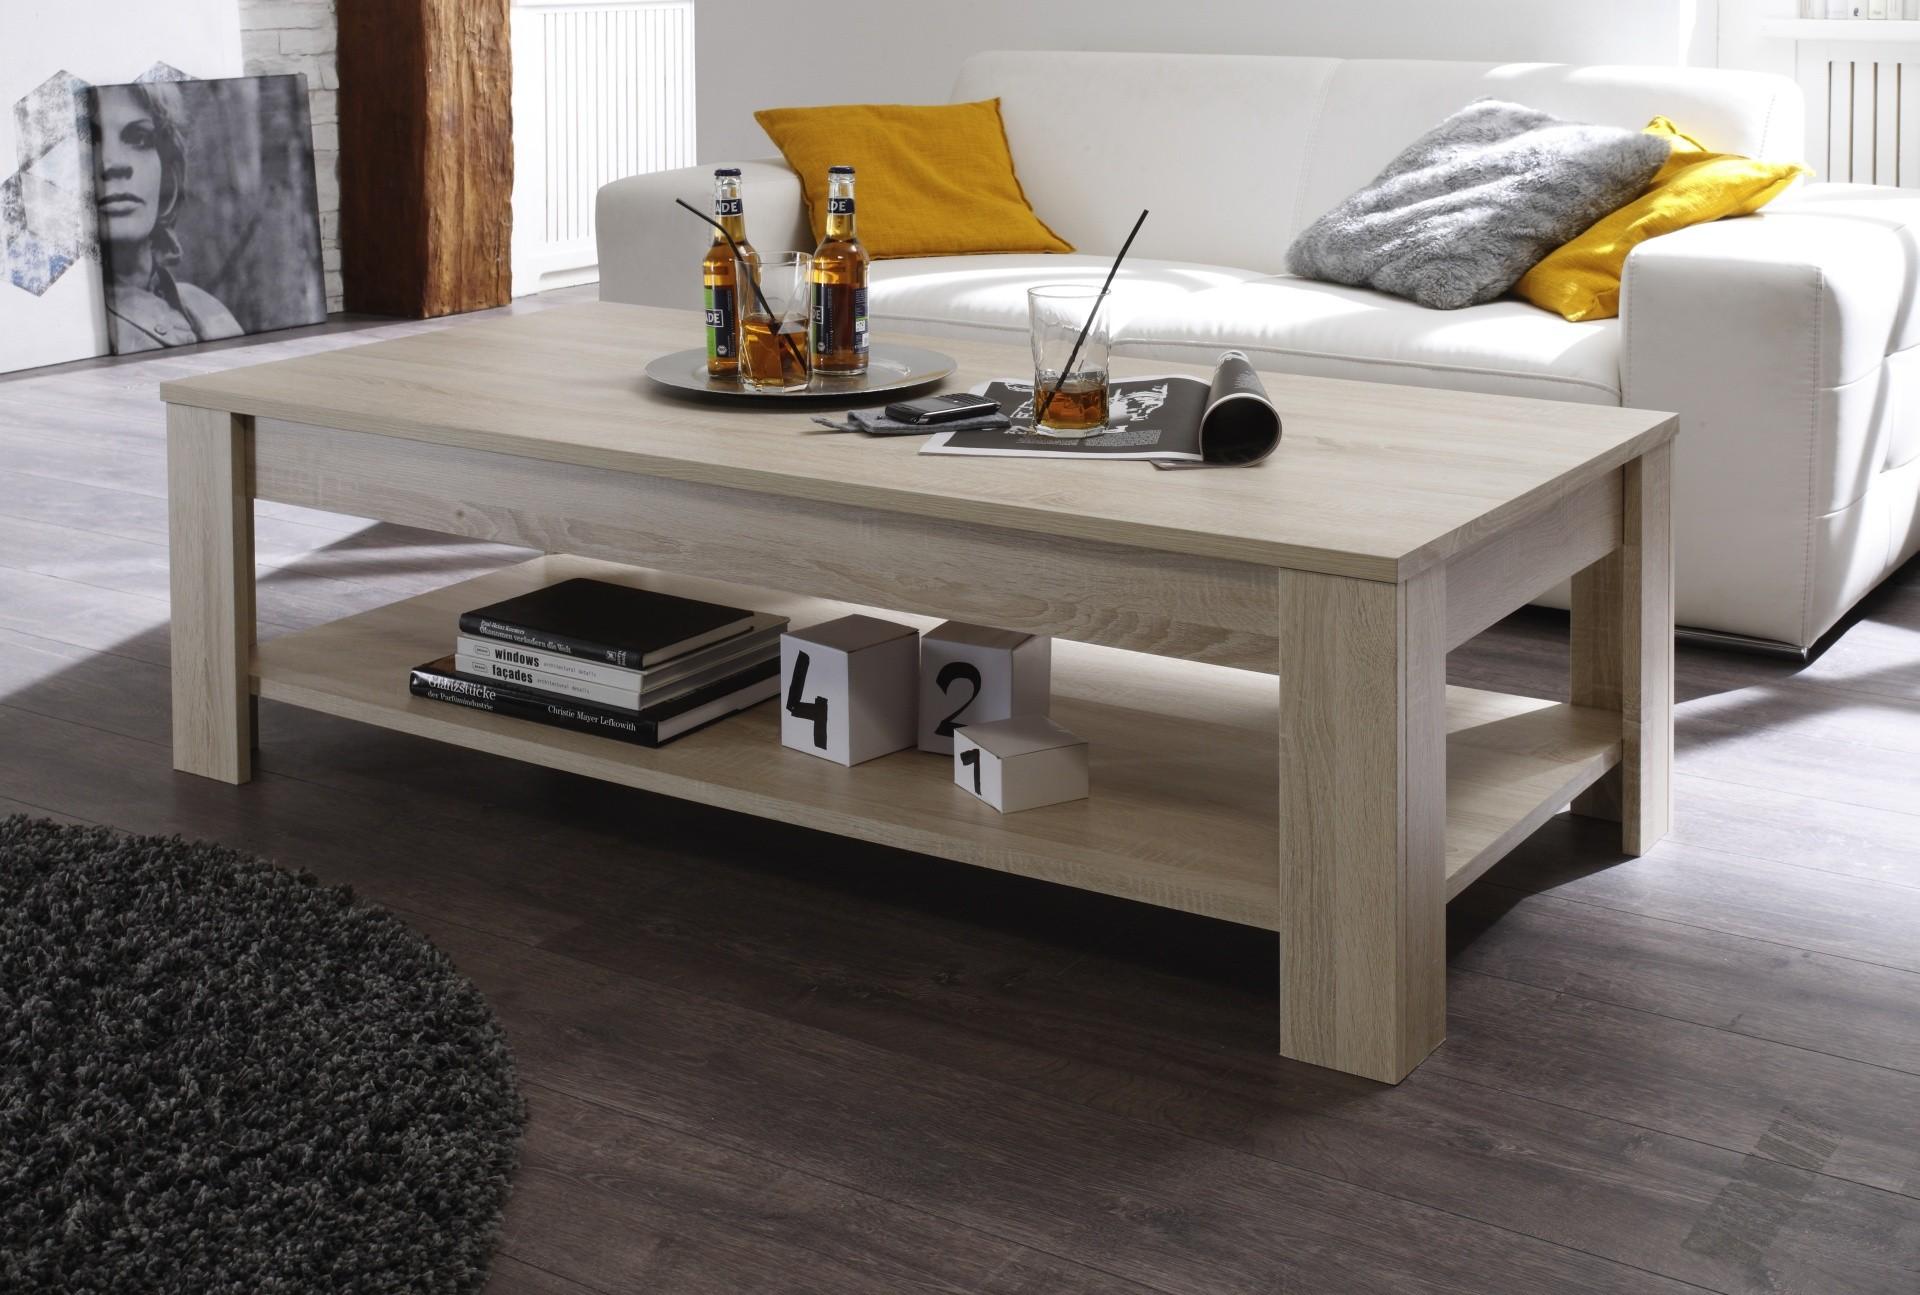 Table basse de salon rustica ch ne clair prix discount - Meuble salon chene clair ...